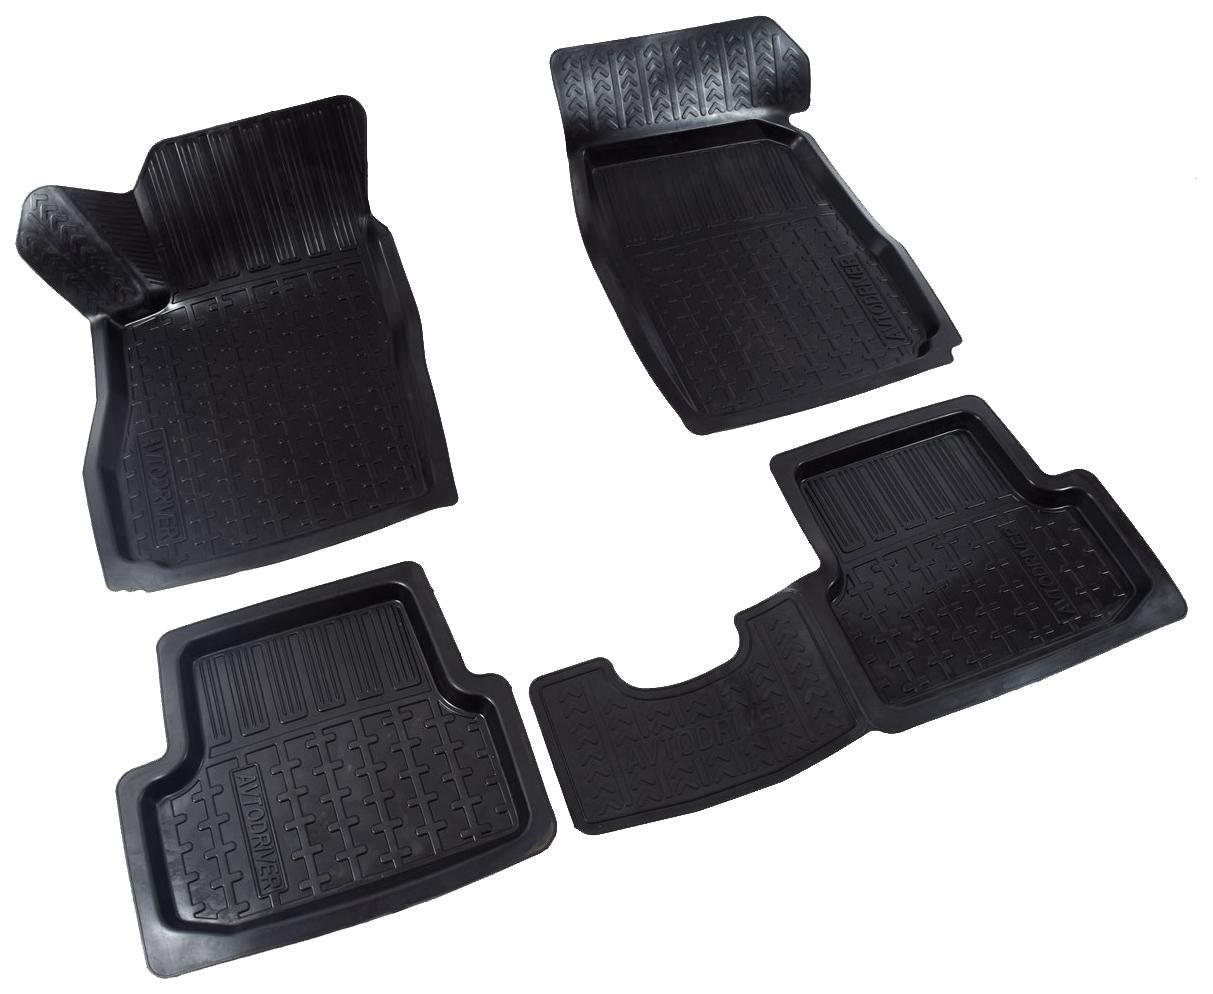 Комплект ковриков в салон автомобиля для Chevrolet, Ravon Nexia AVTODRIVER (ADRAVG271)